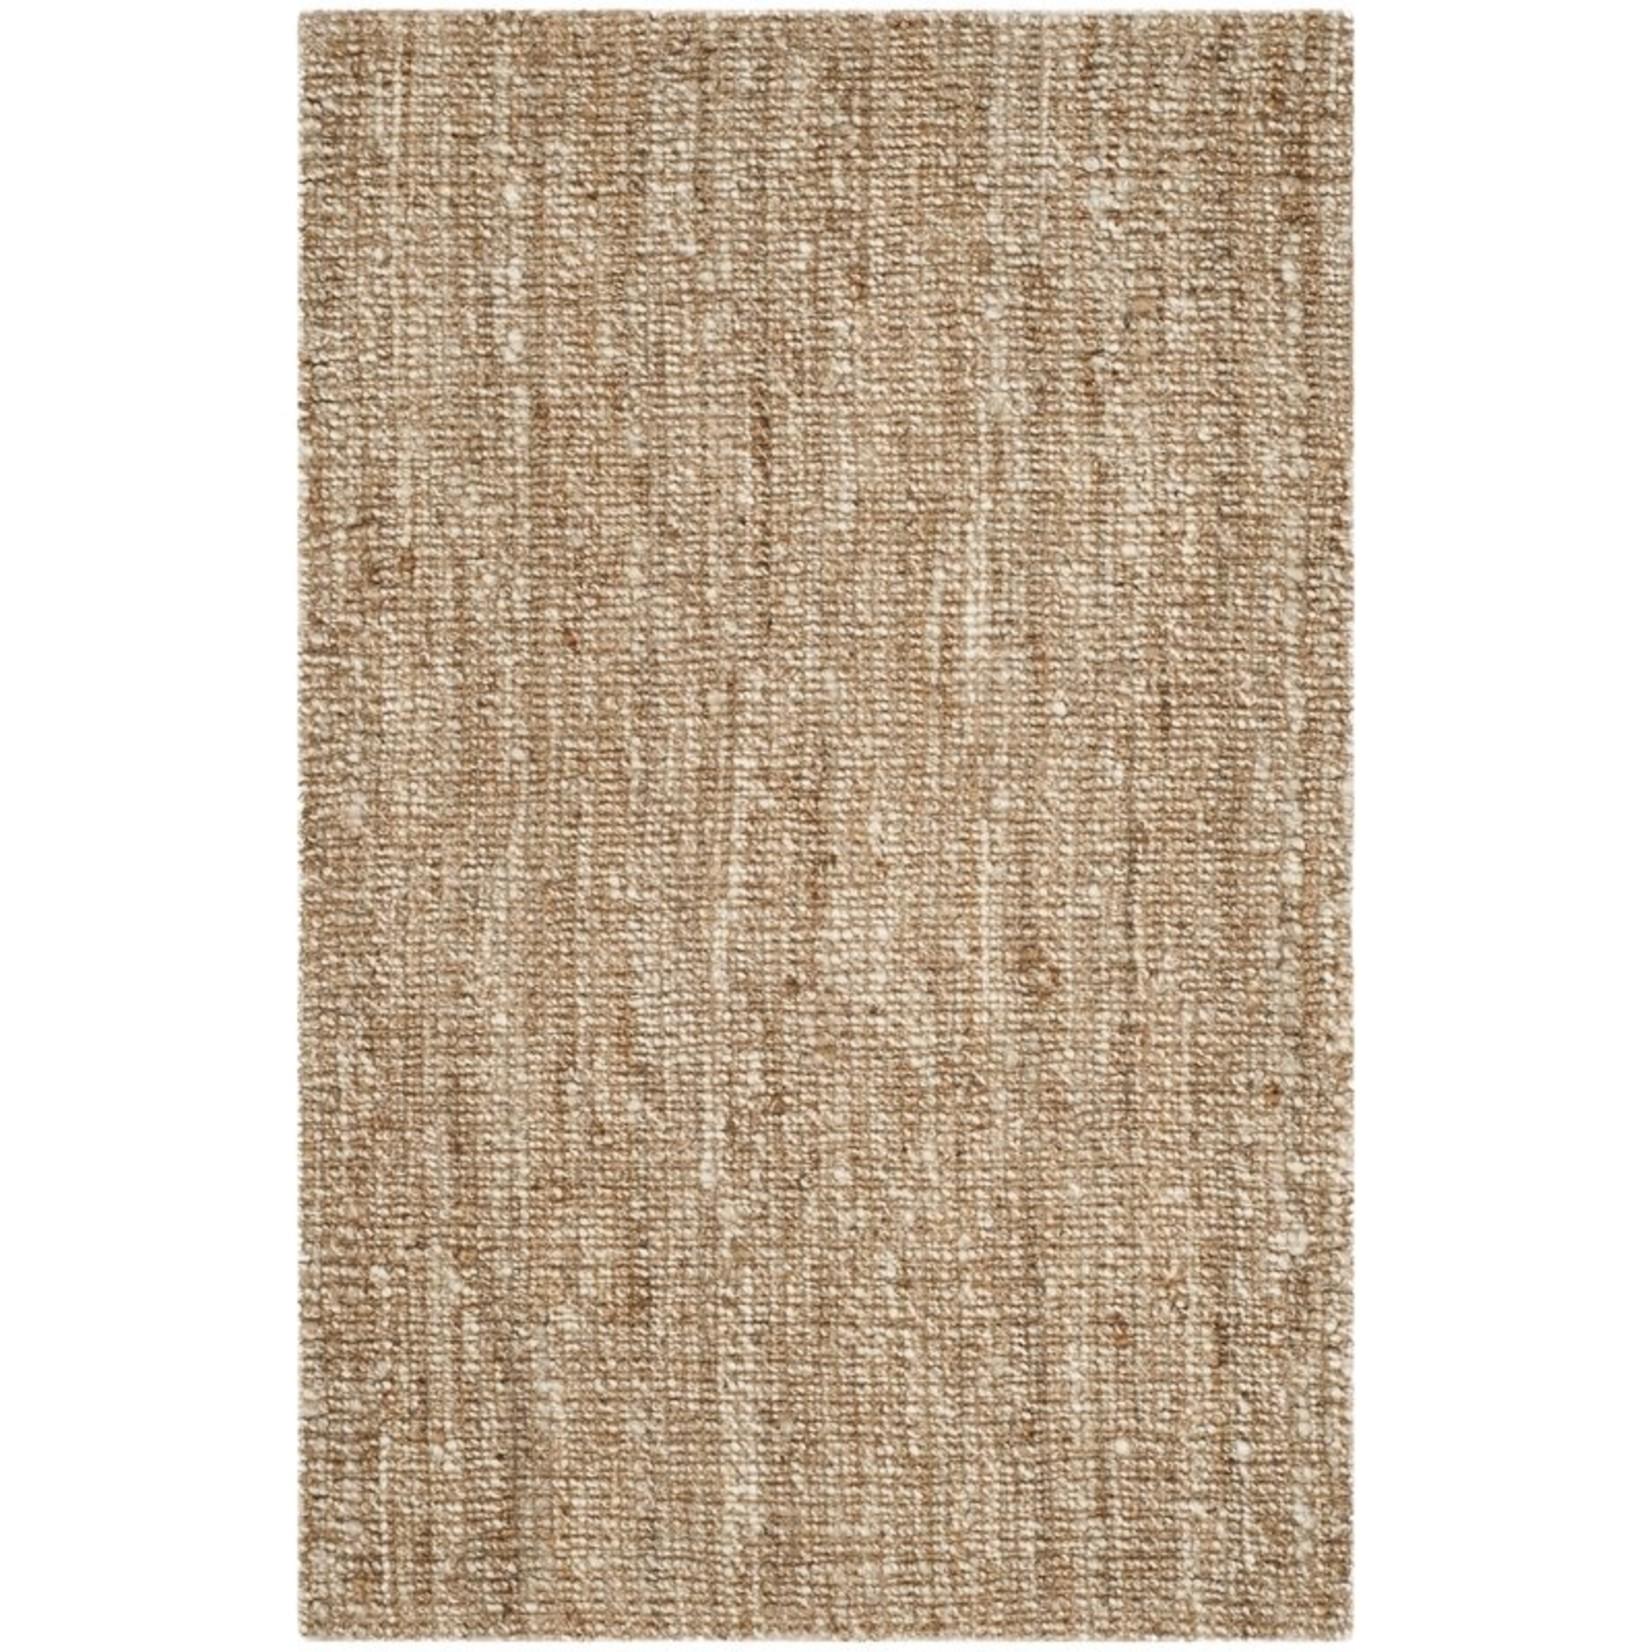 *4' x 6' - Waldenburg Handmade Flatweave Jute/Sisal Beige Area Rug